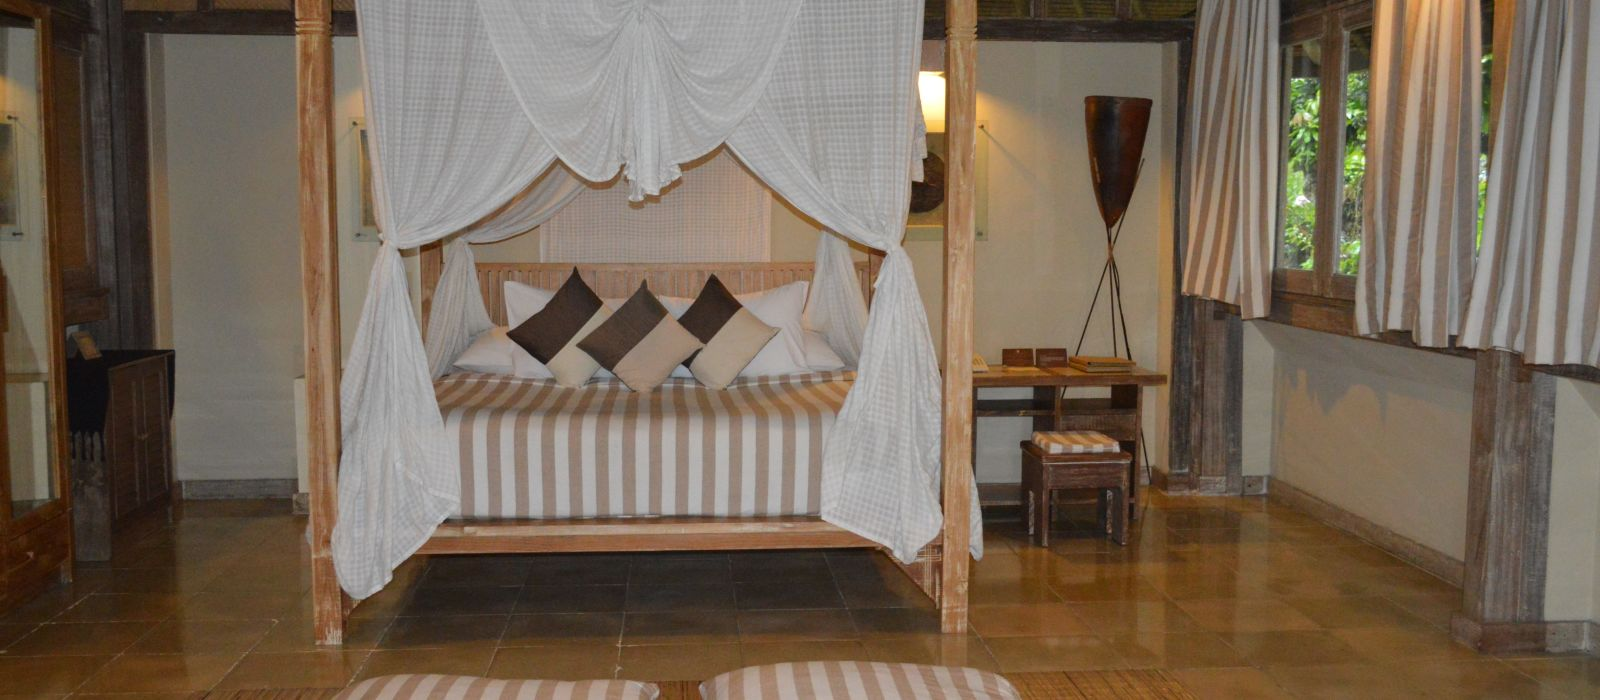 Hotel Wapa di Ume Indonesien